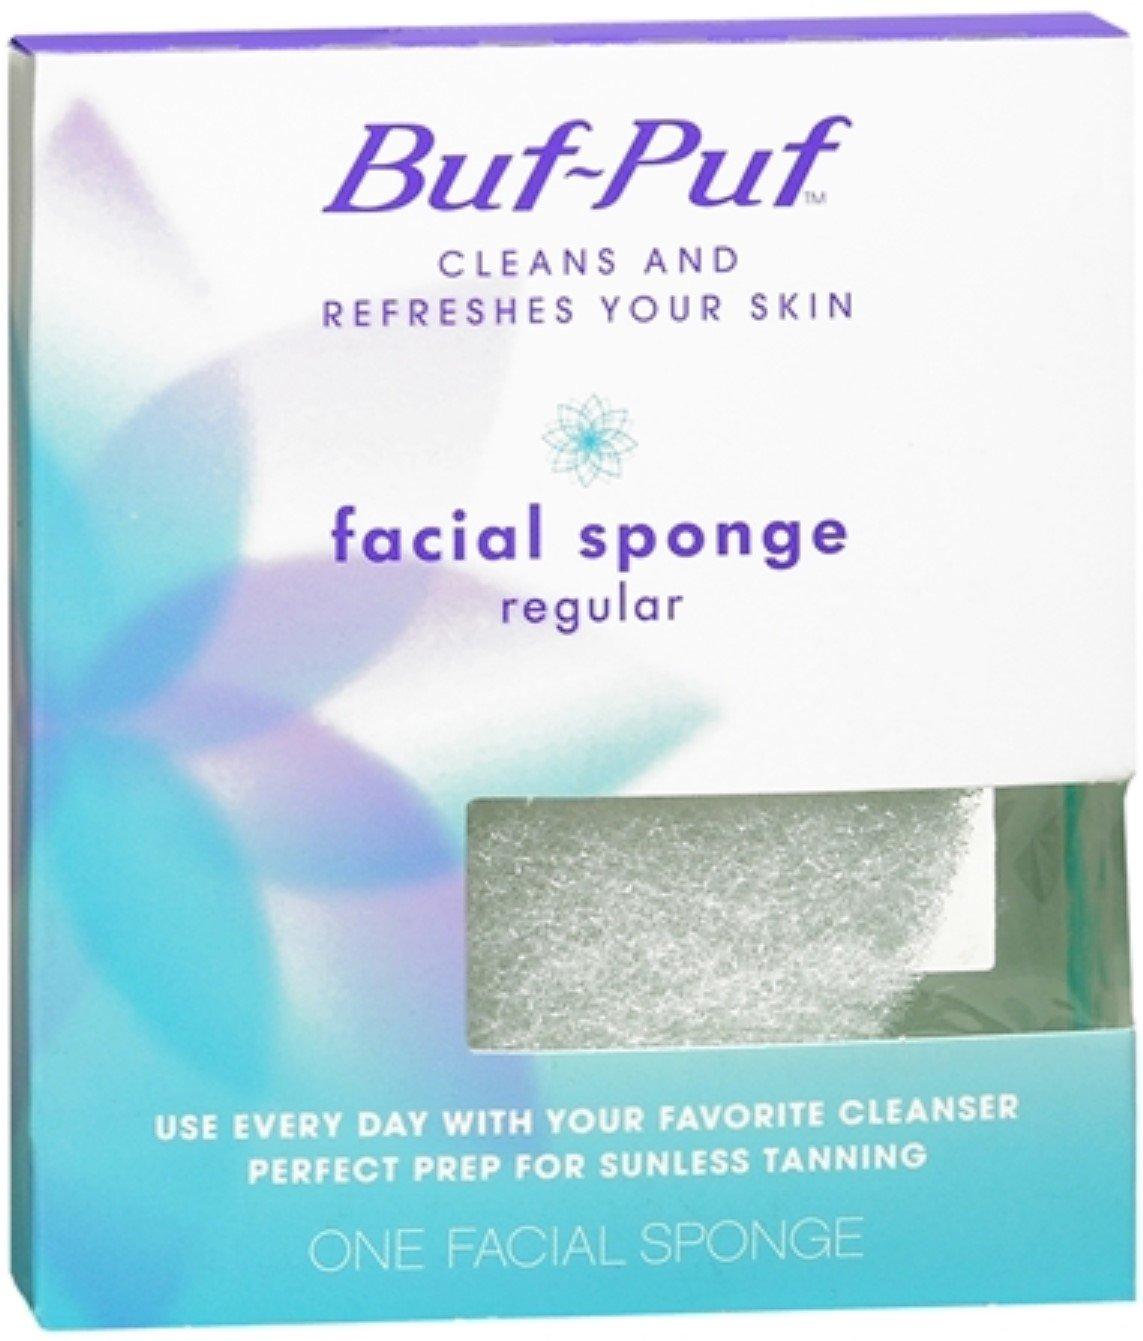 Buf-Puf Regular Facial Sponge 1 Each (Pack of 10)